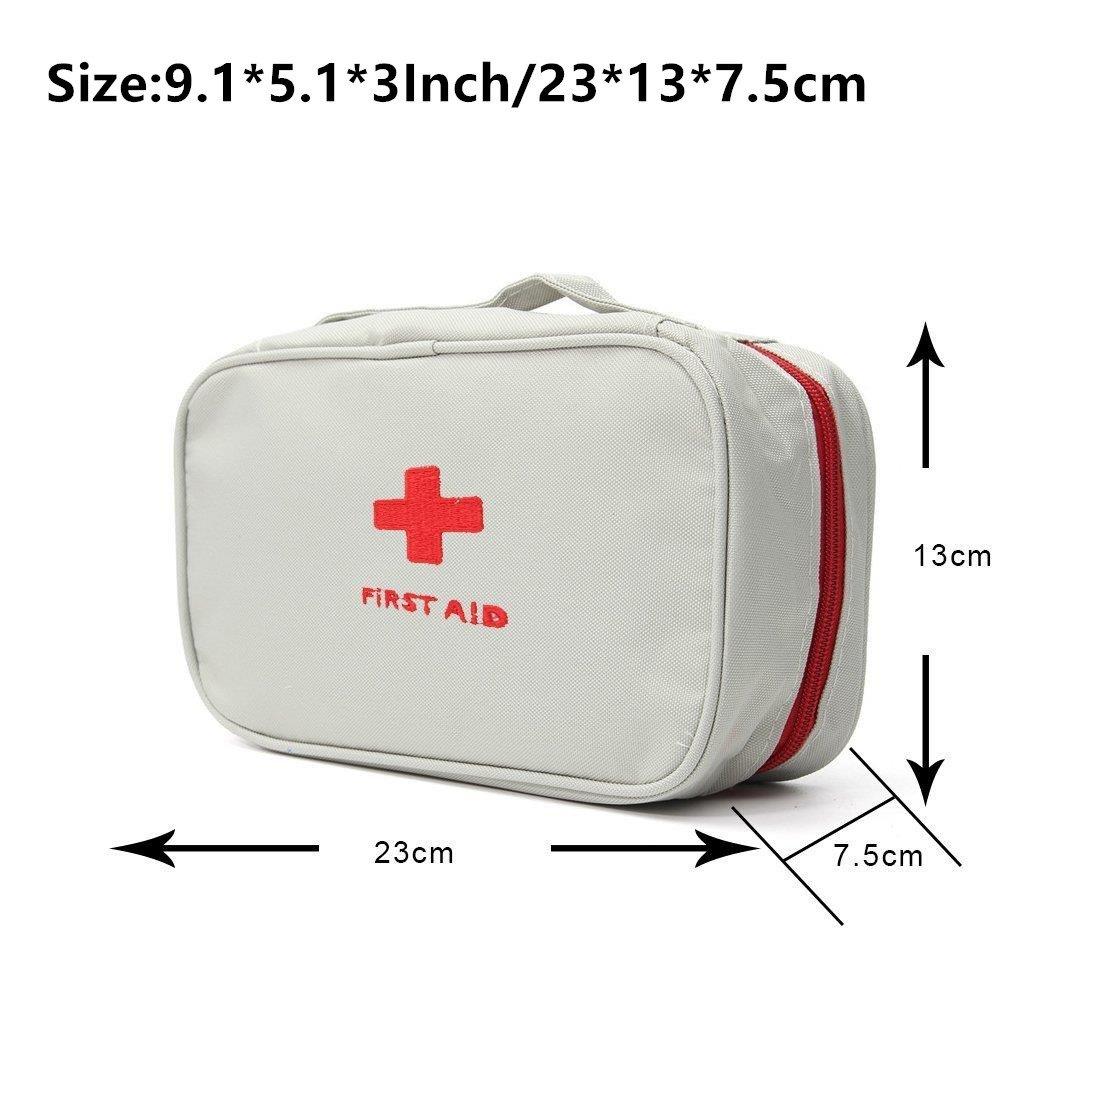 Kit Koffer Aid First Hilfe Erste SetLifesport uKcJlFT13